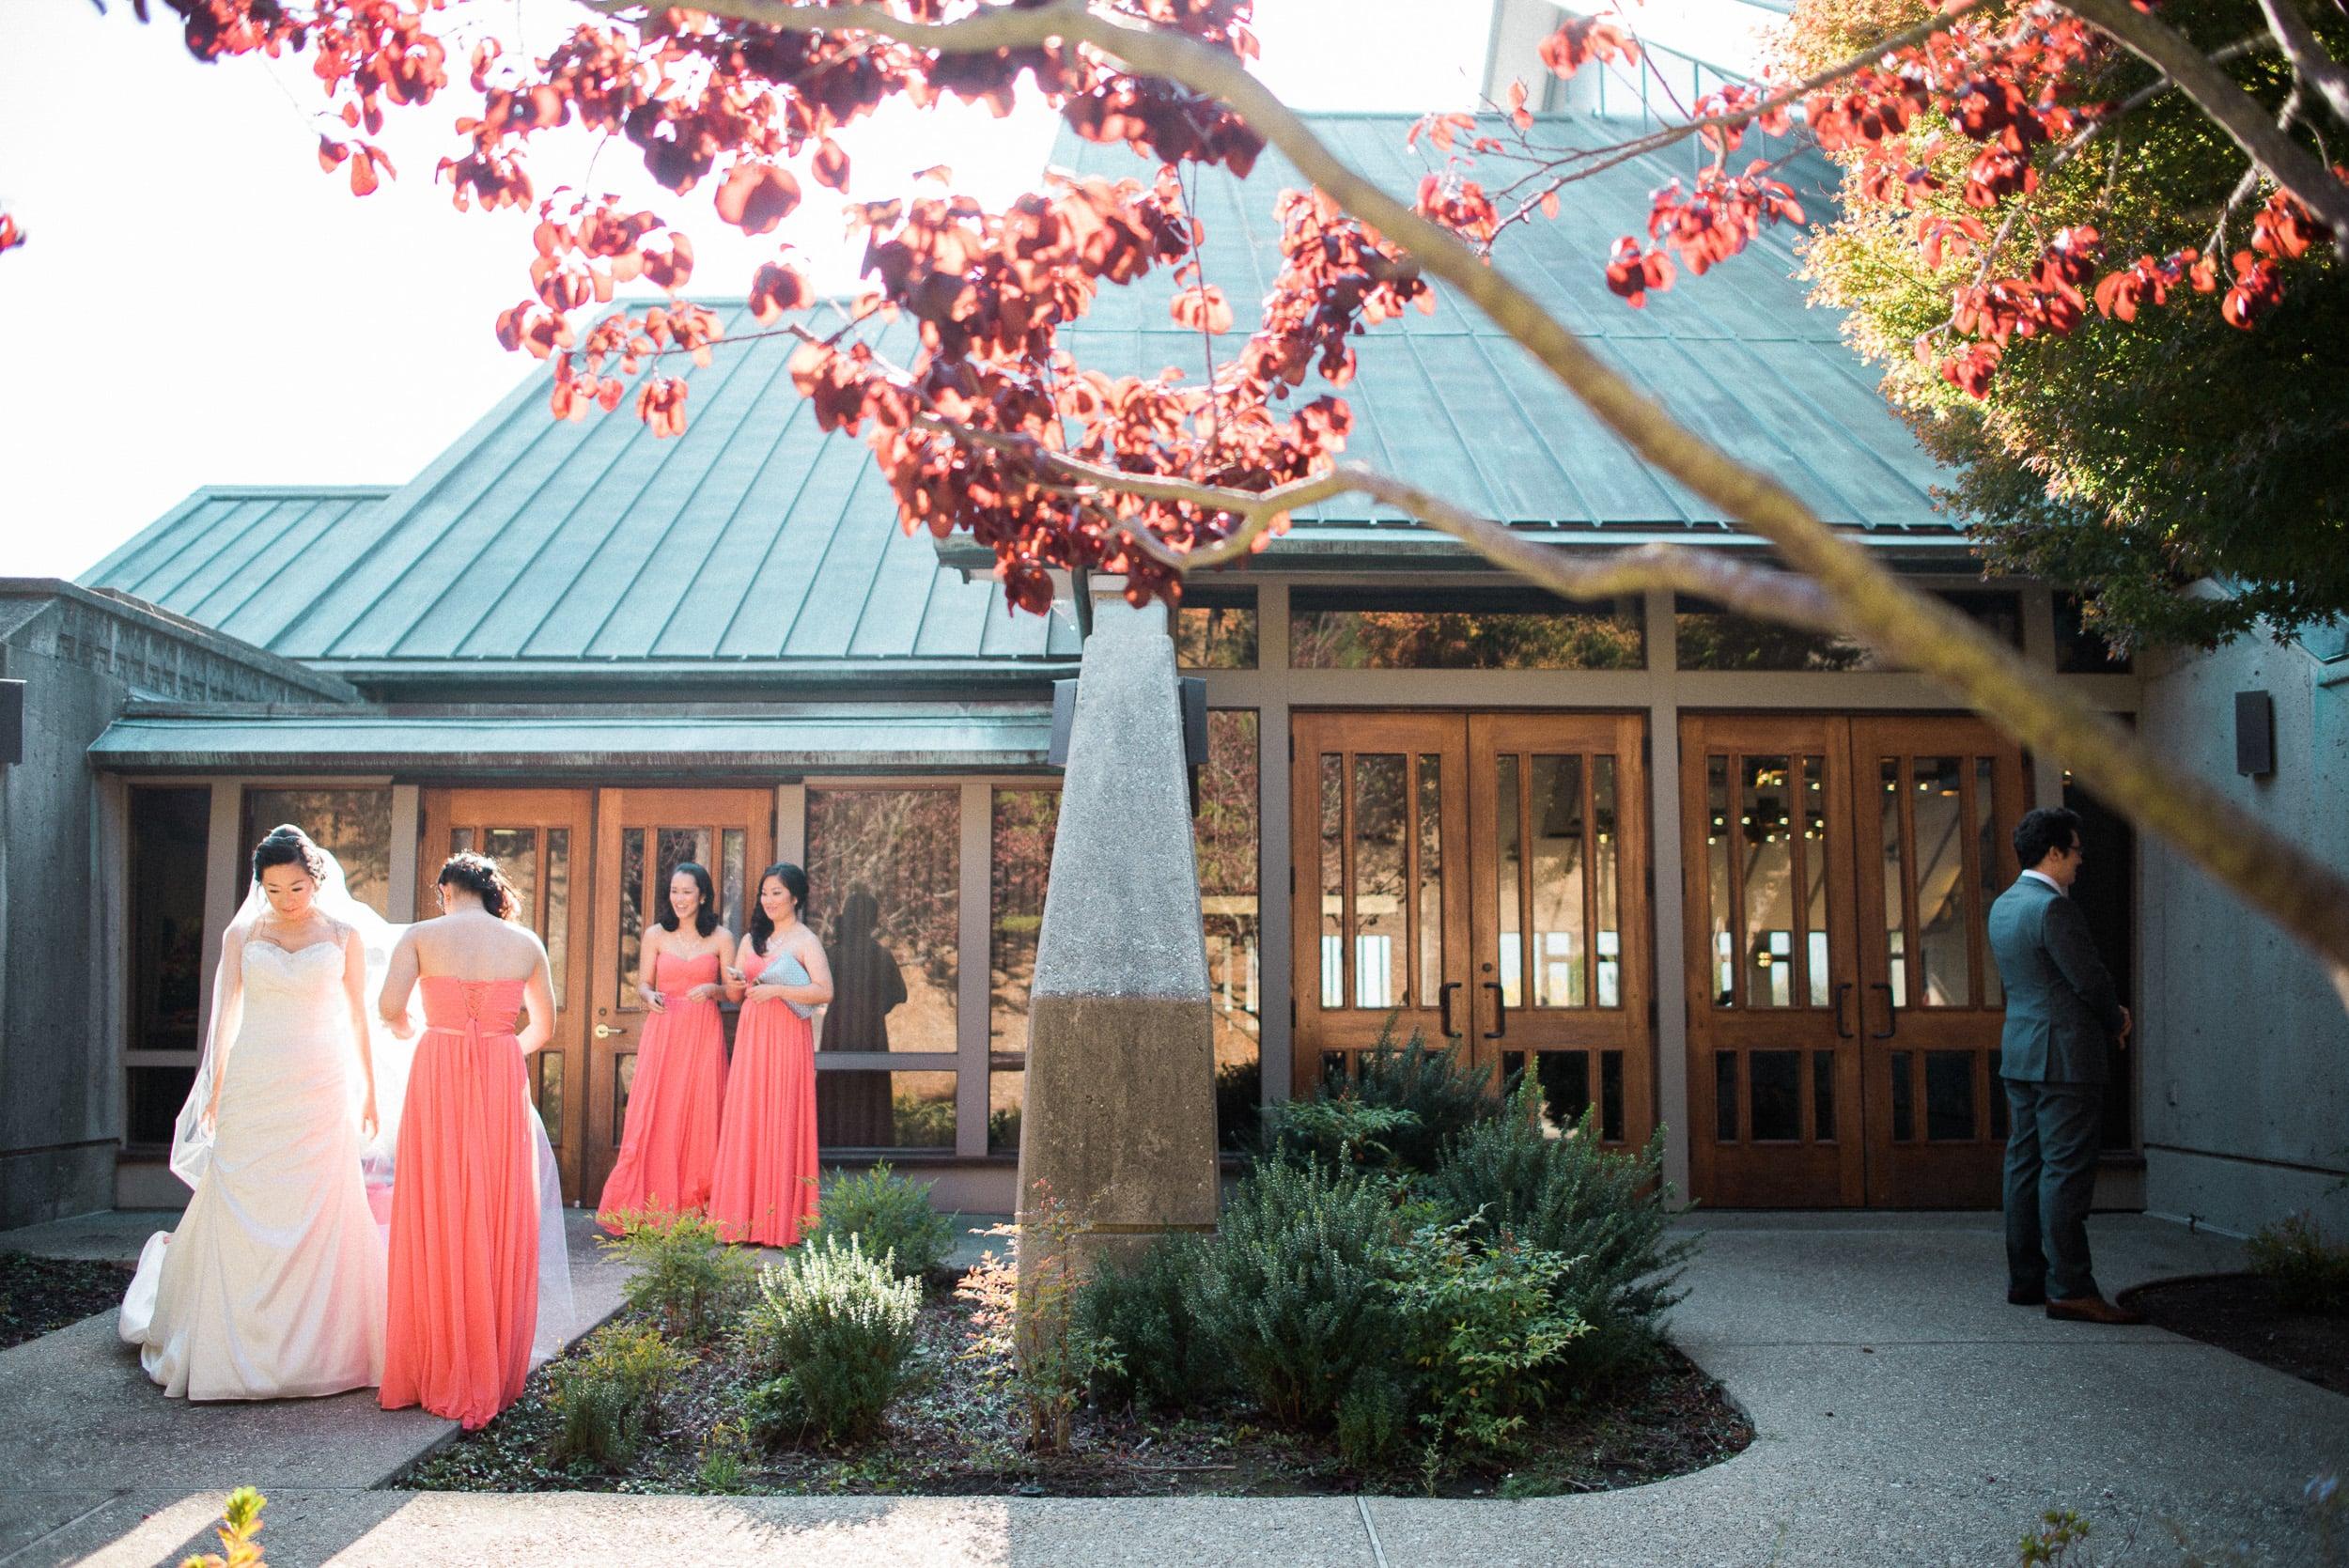 Moraga Valley Church wedding 001-2.jpg